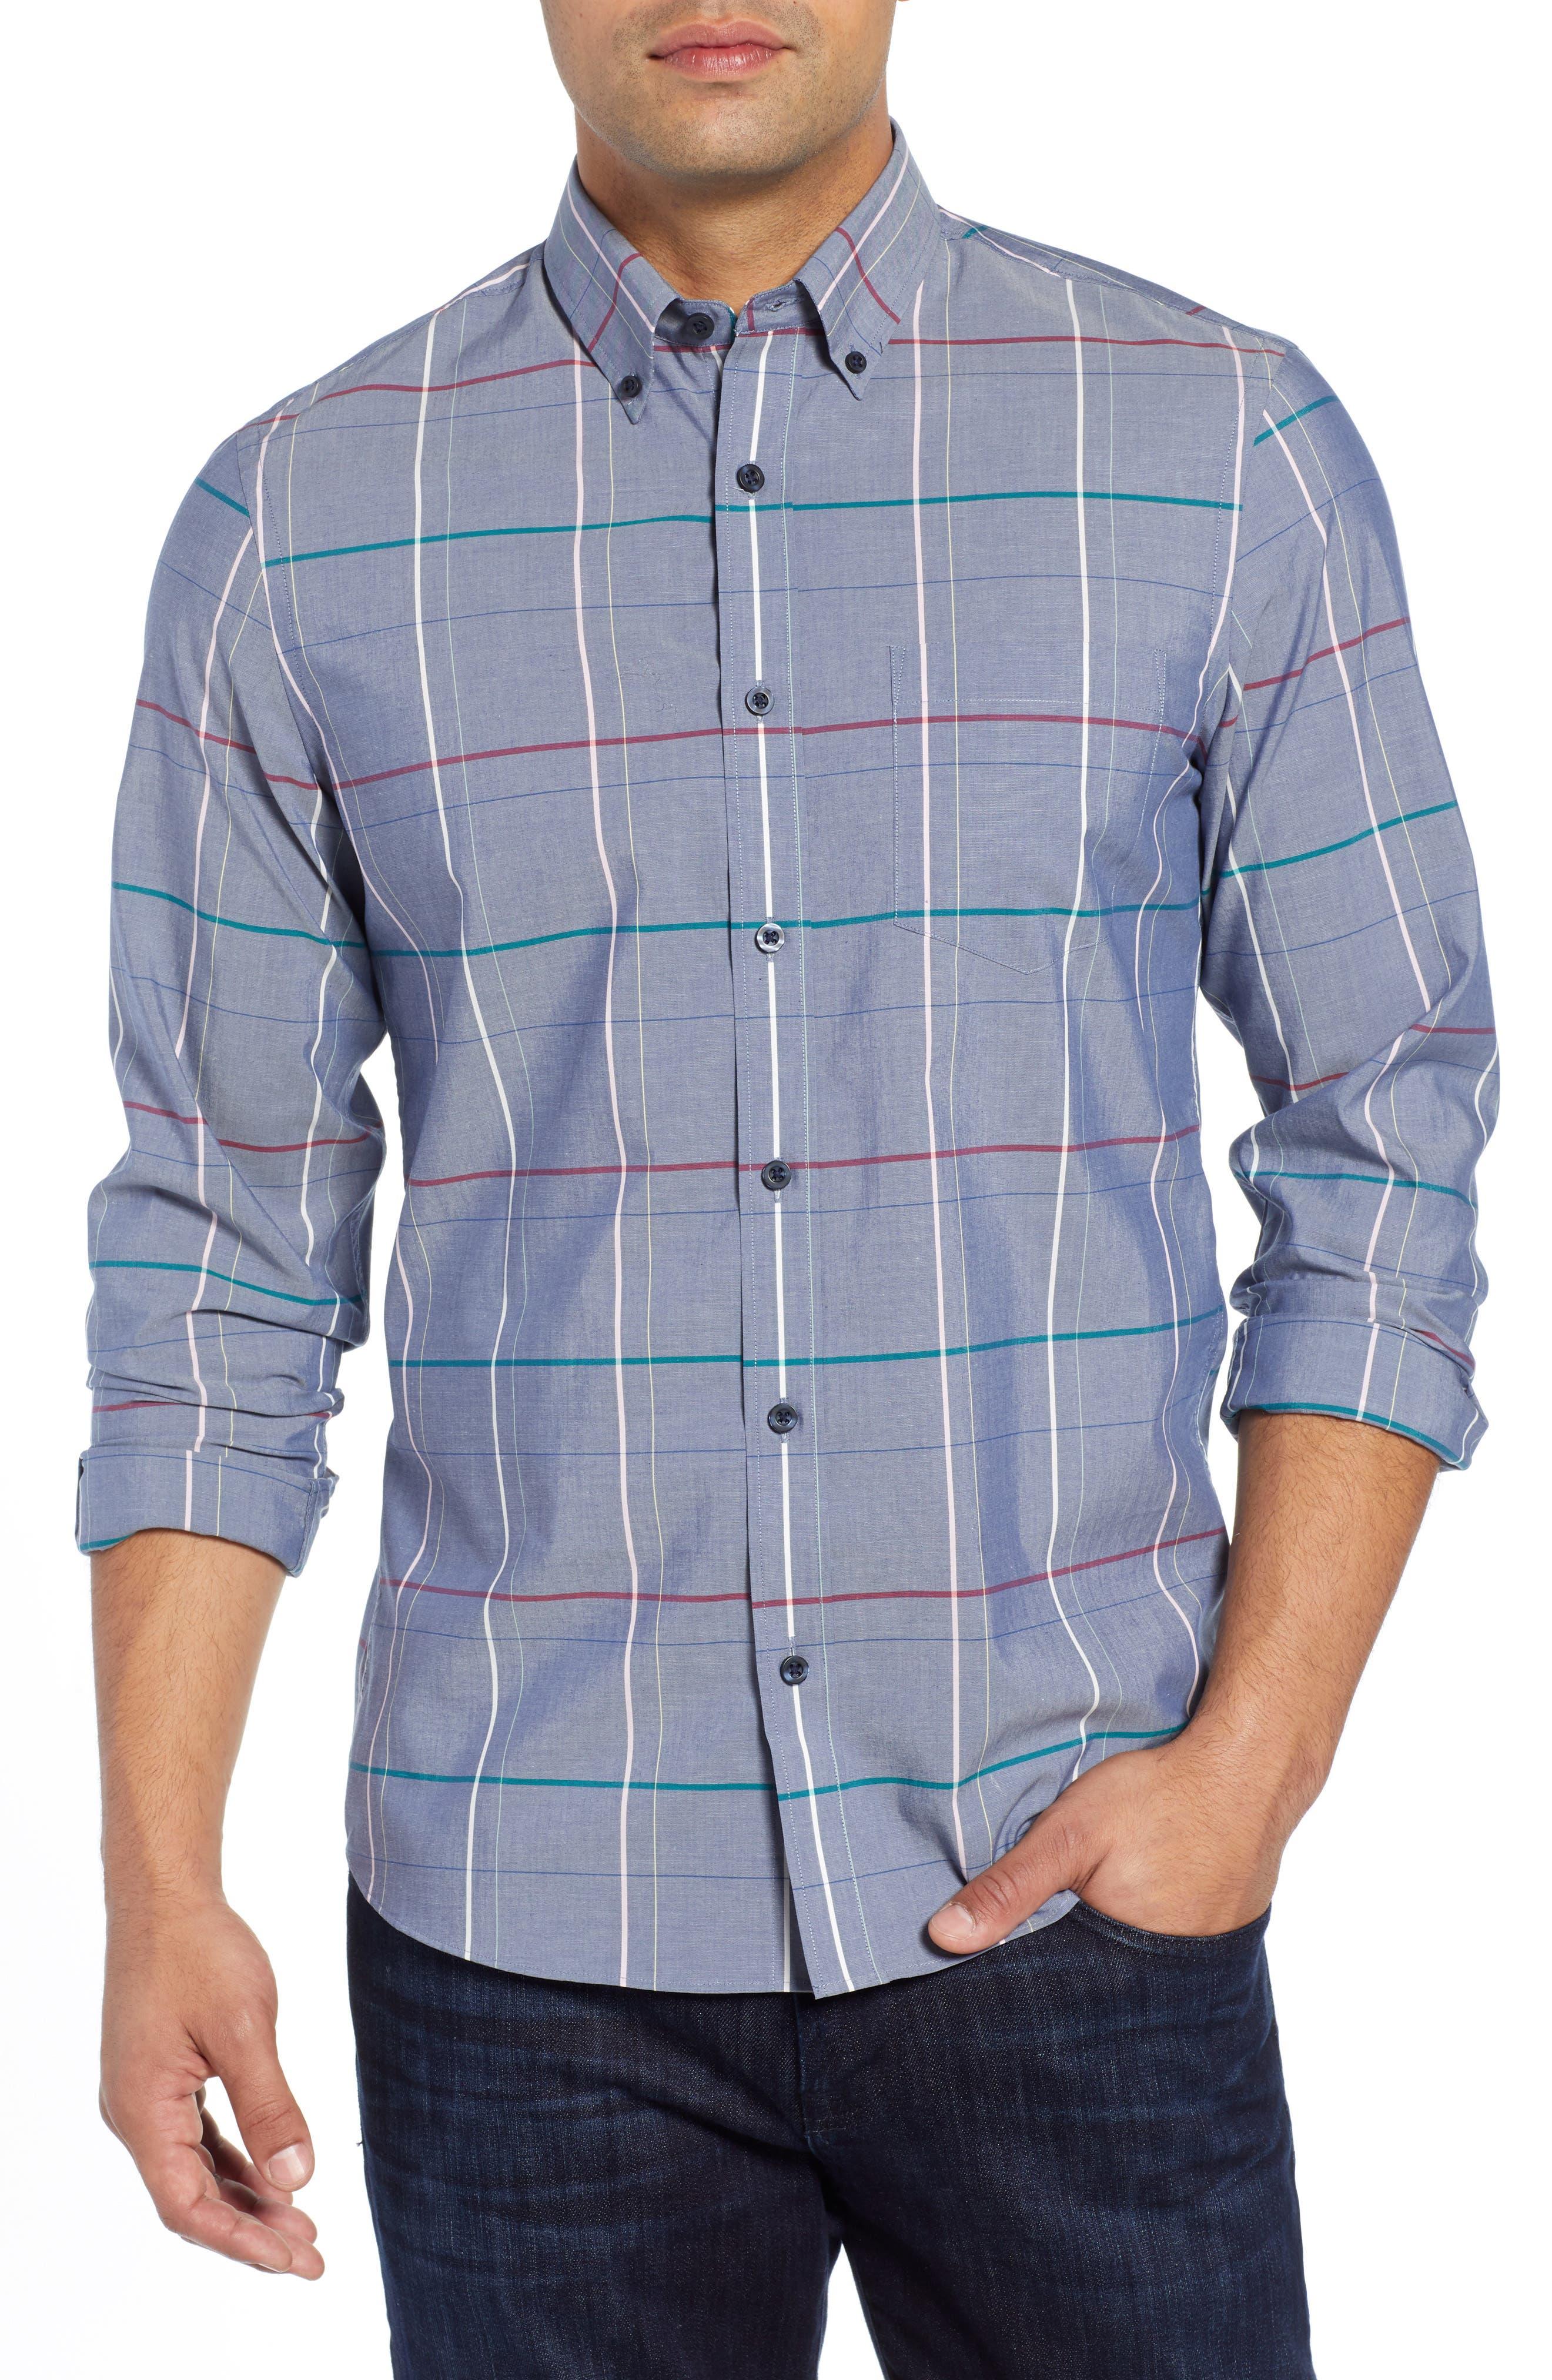 Tech-Smart Slim Fit Multi Pane Sport Shirt,                         Main,                         color, BLUE CHAMBRAY MULTI PANE